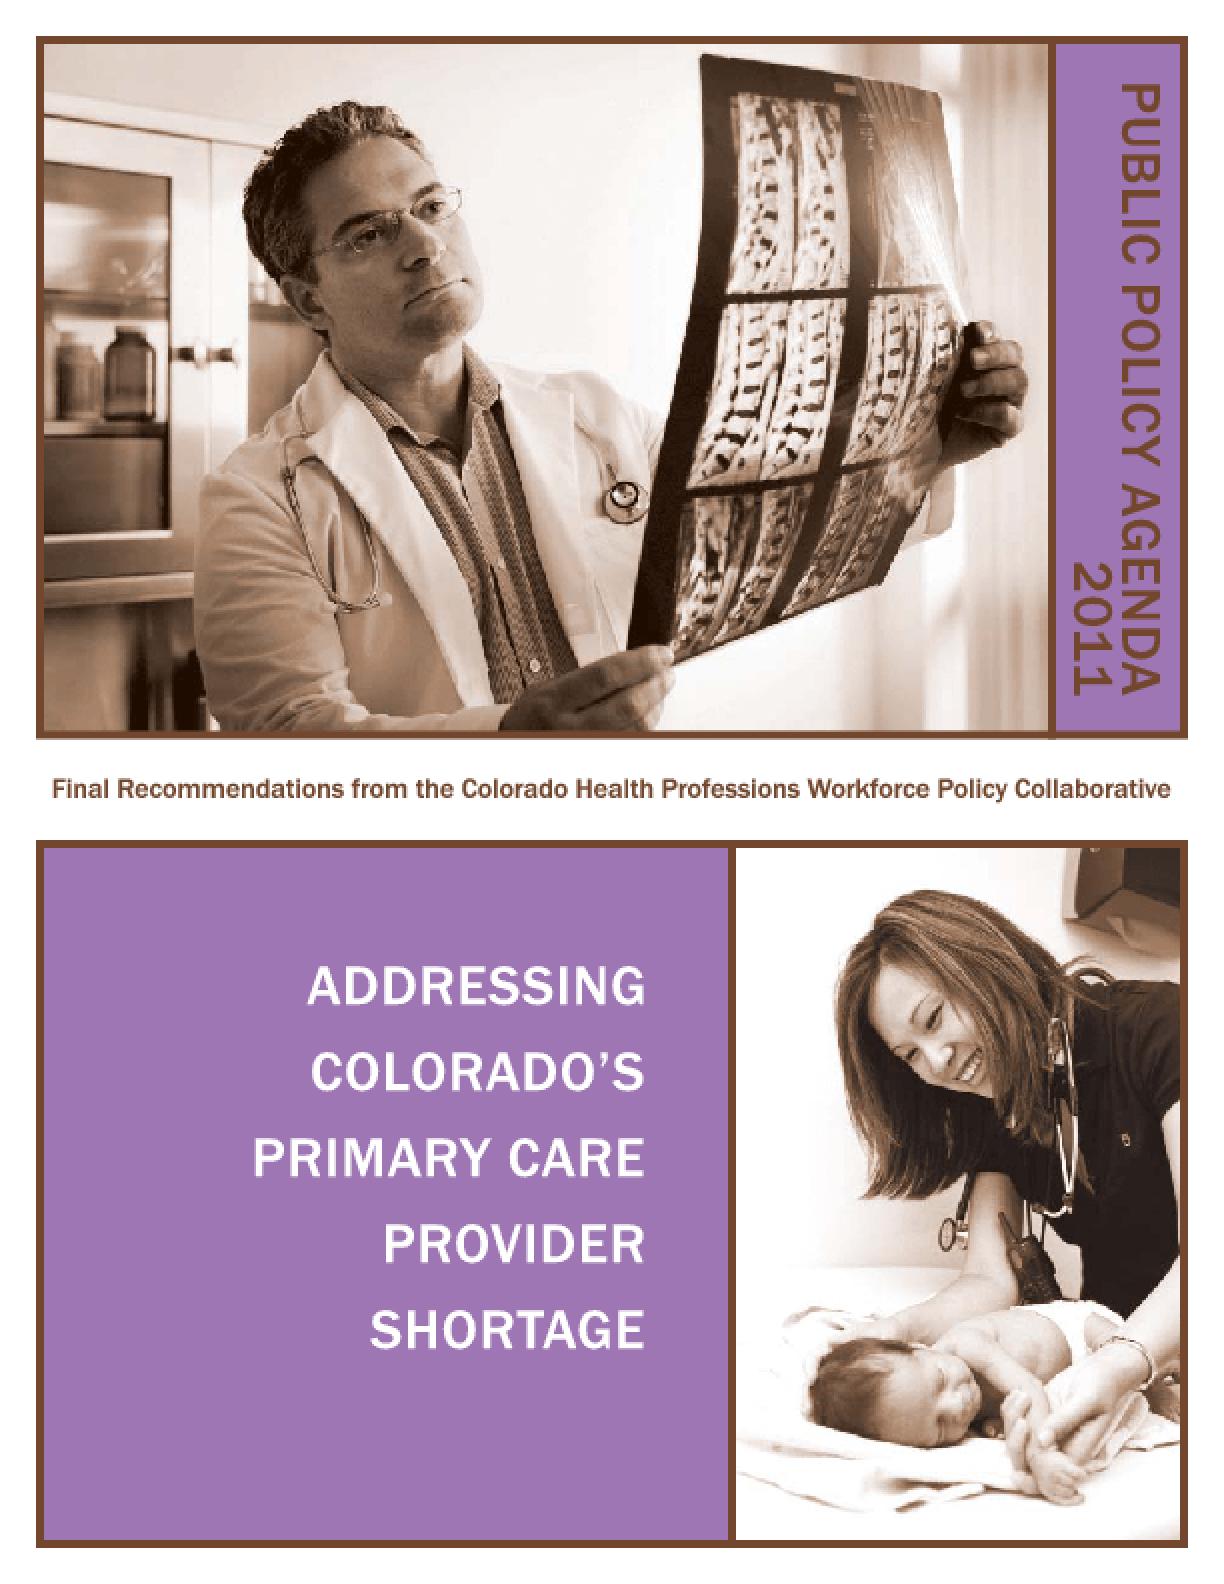 Addressing Colorado's Primary Care Provider Shortage -- 2011 Public Policy Agenda